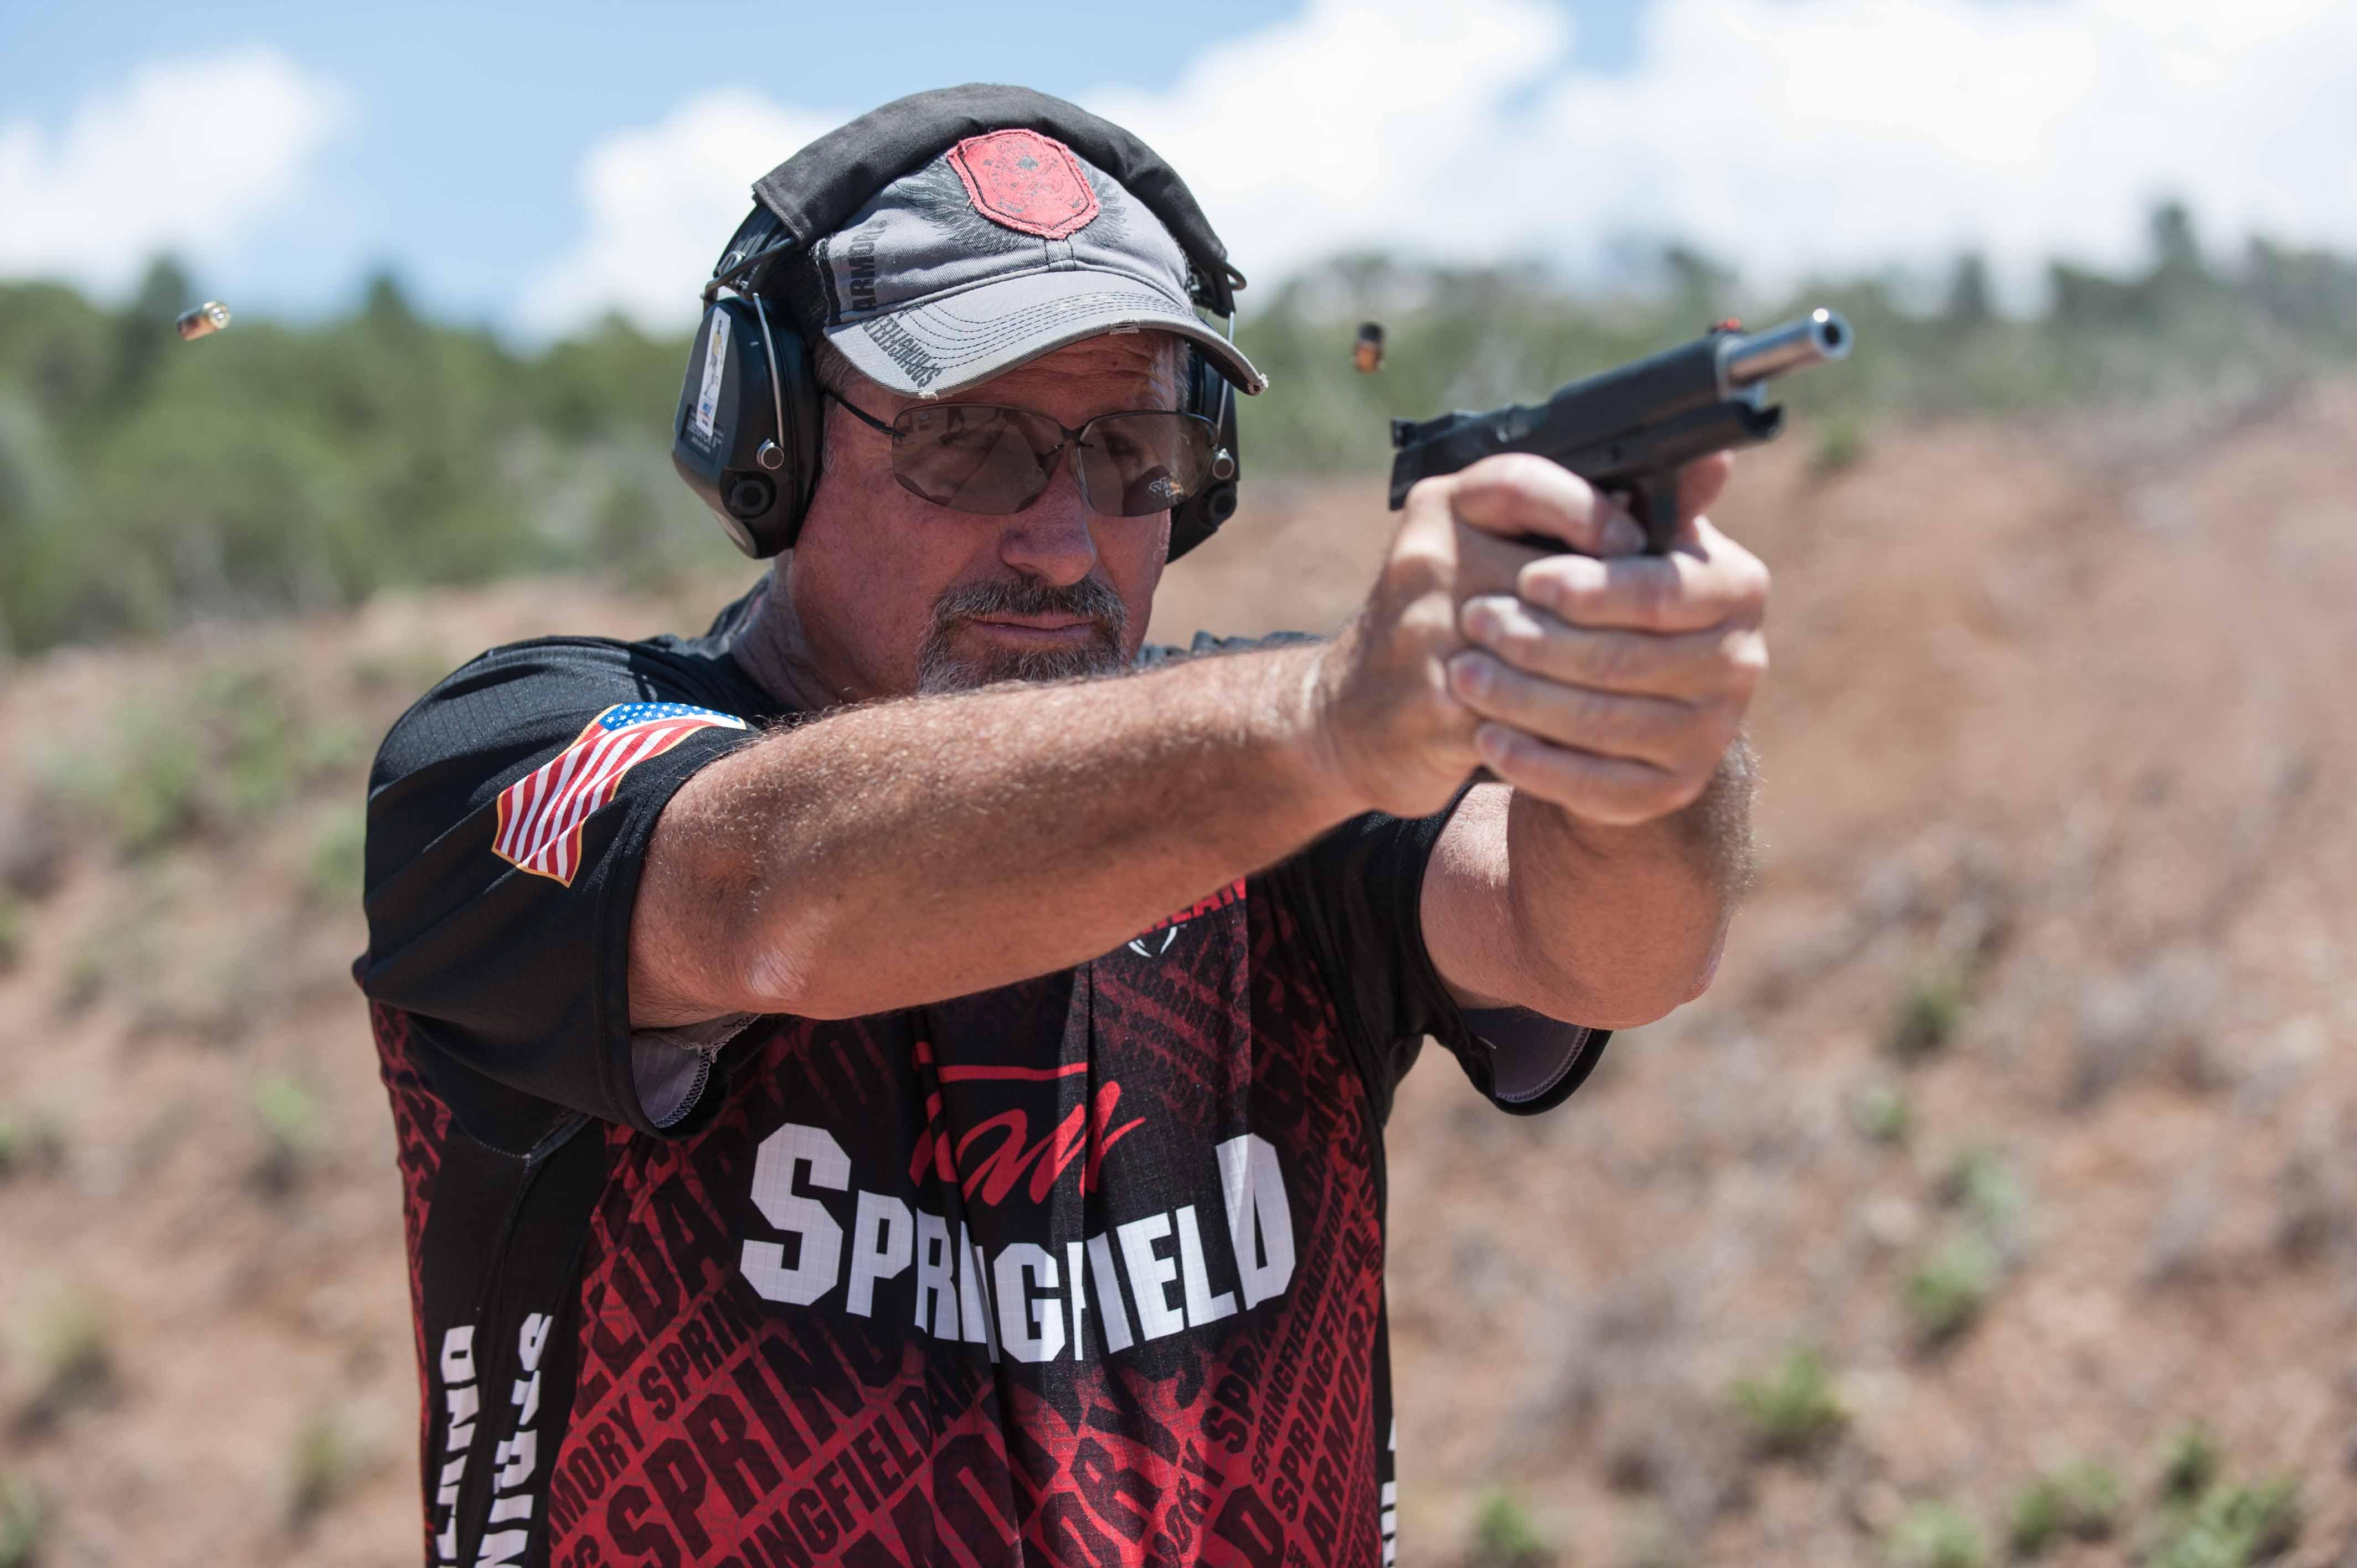 Rob shooting RO Elite Target model_JSP0641.jpg